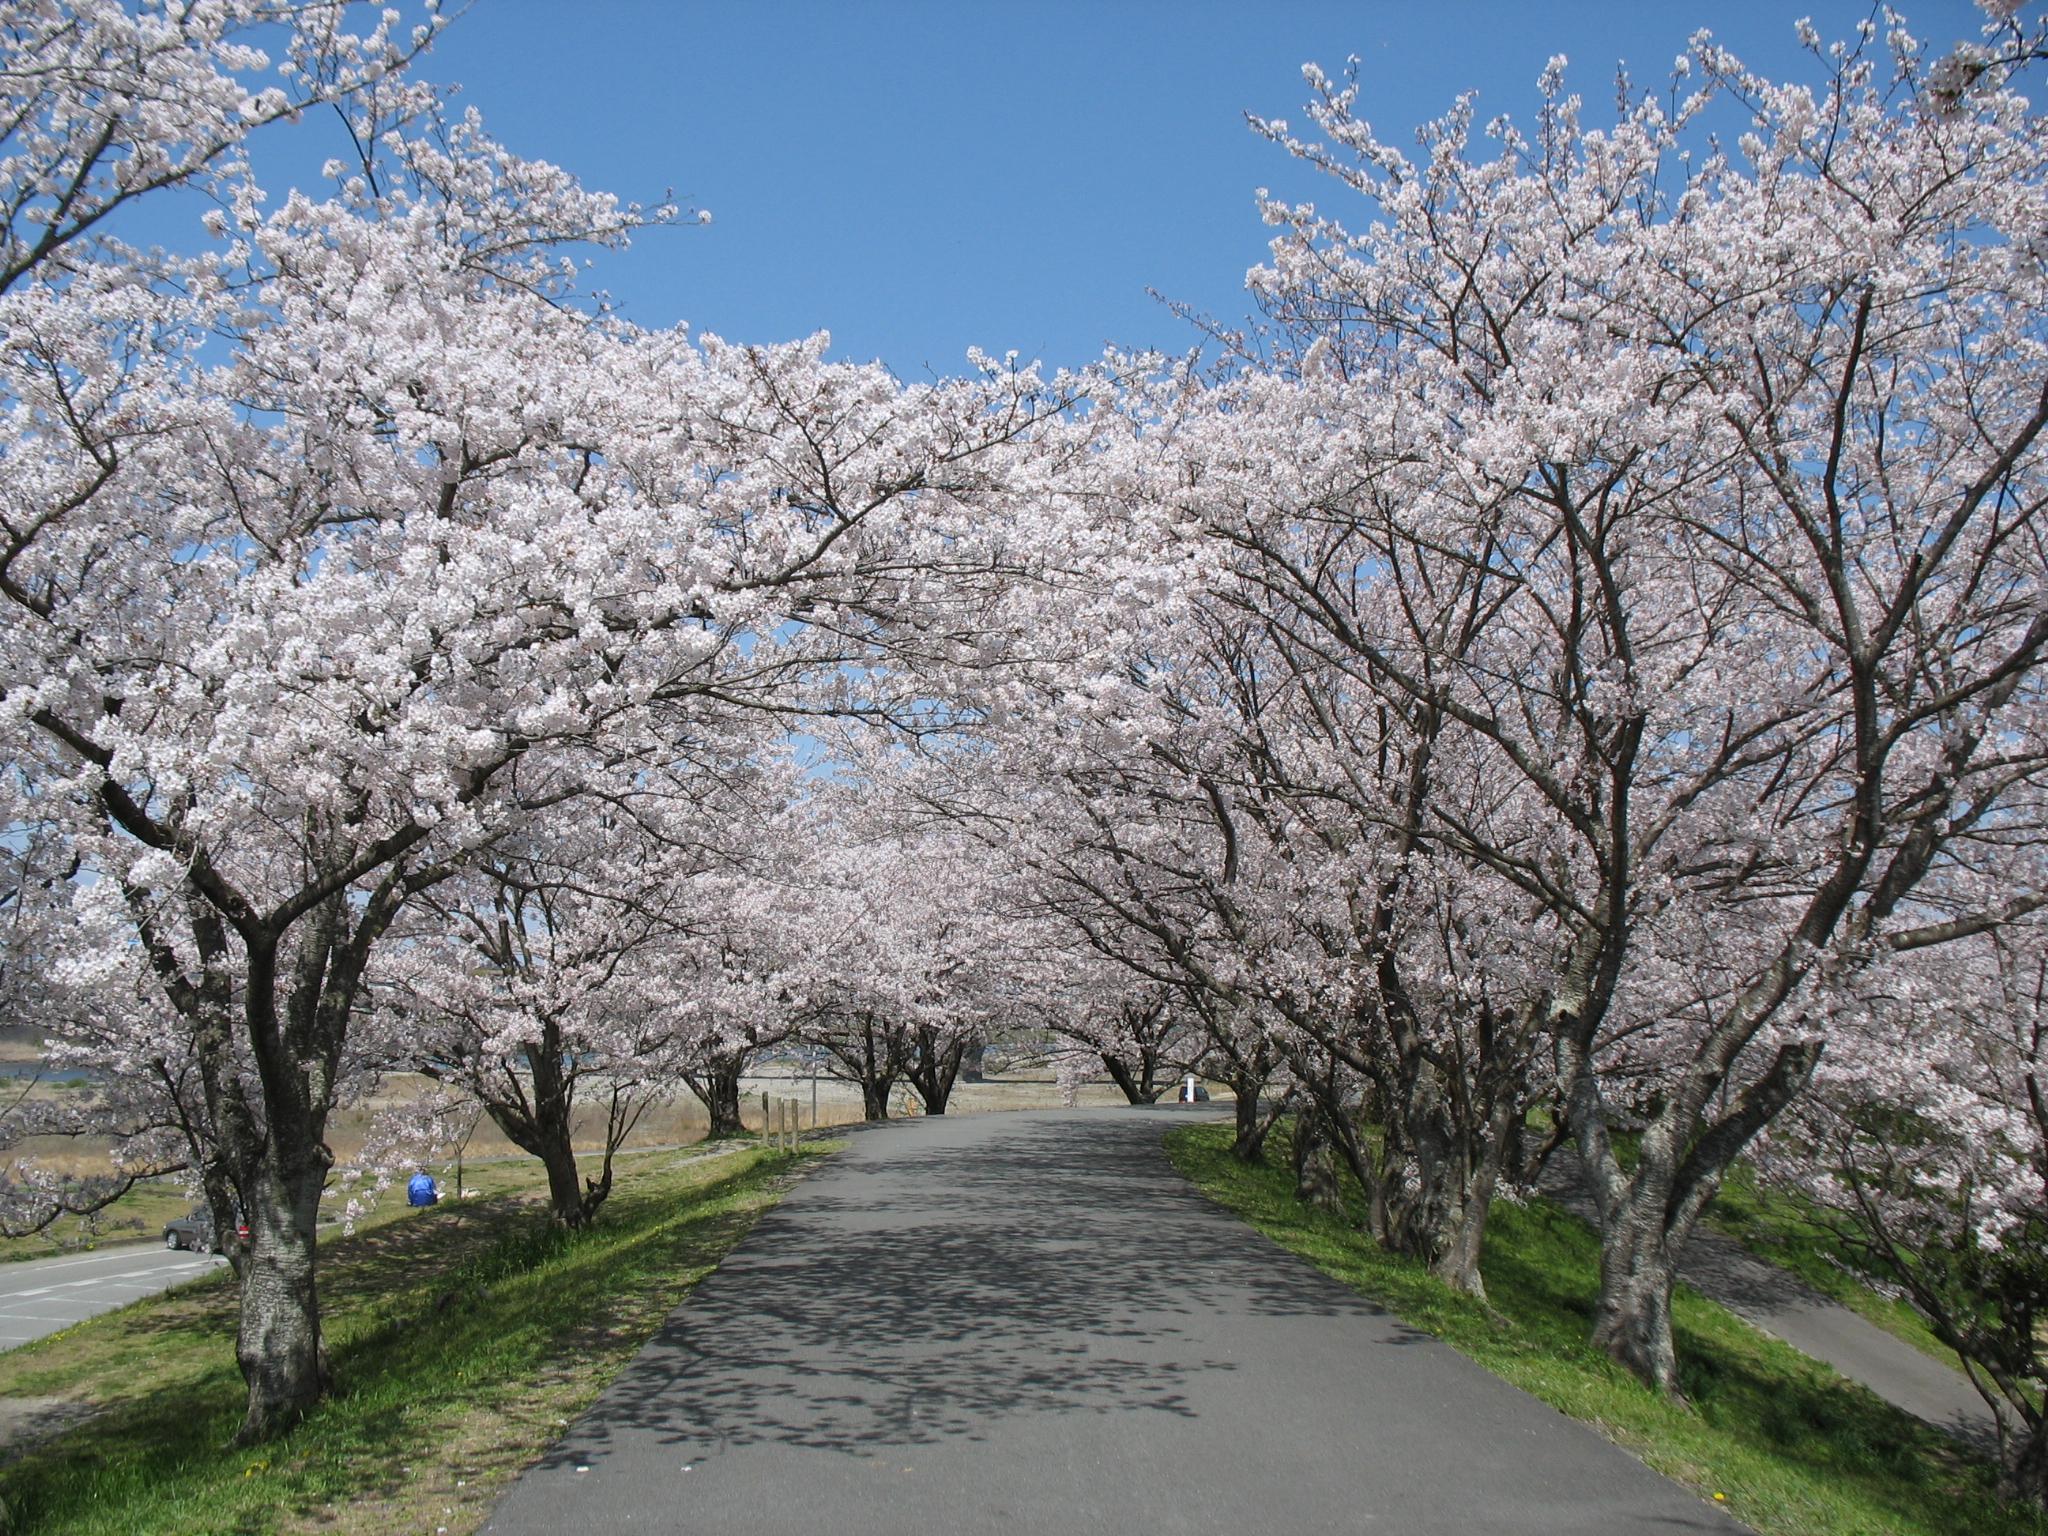 Kirschblüten säumen den Weg